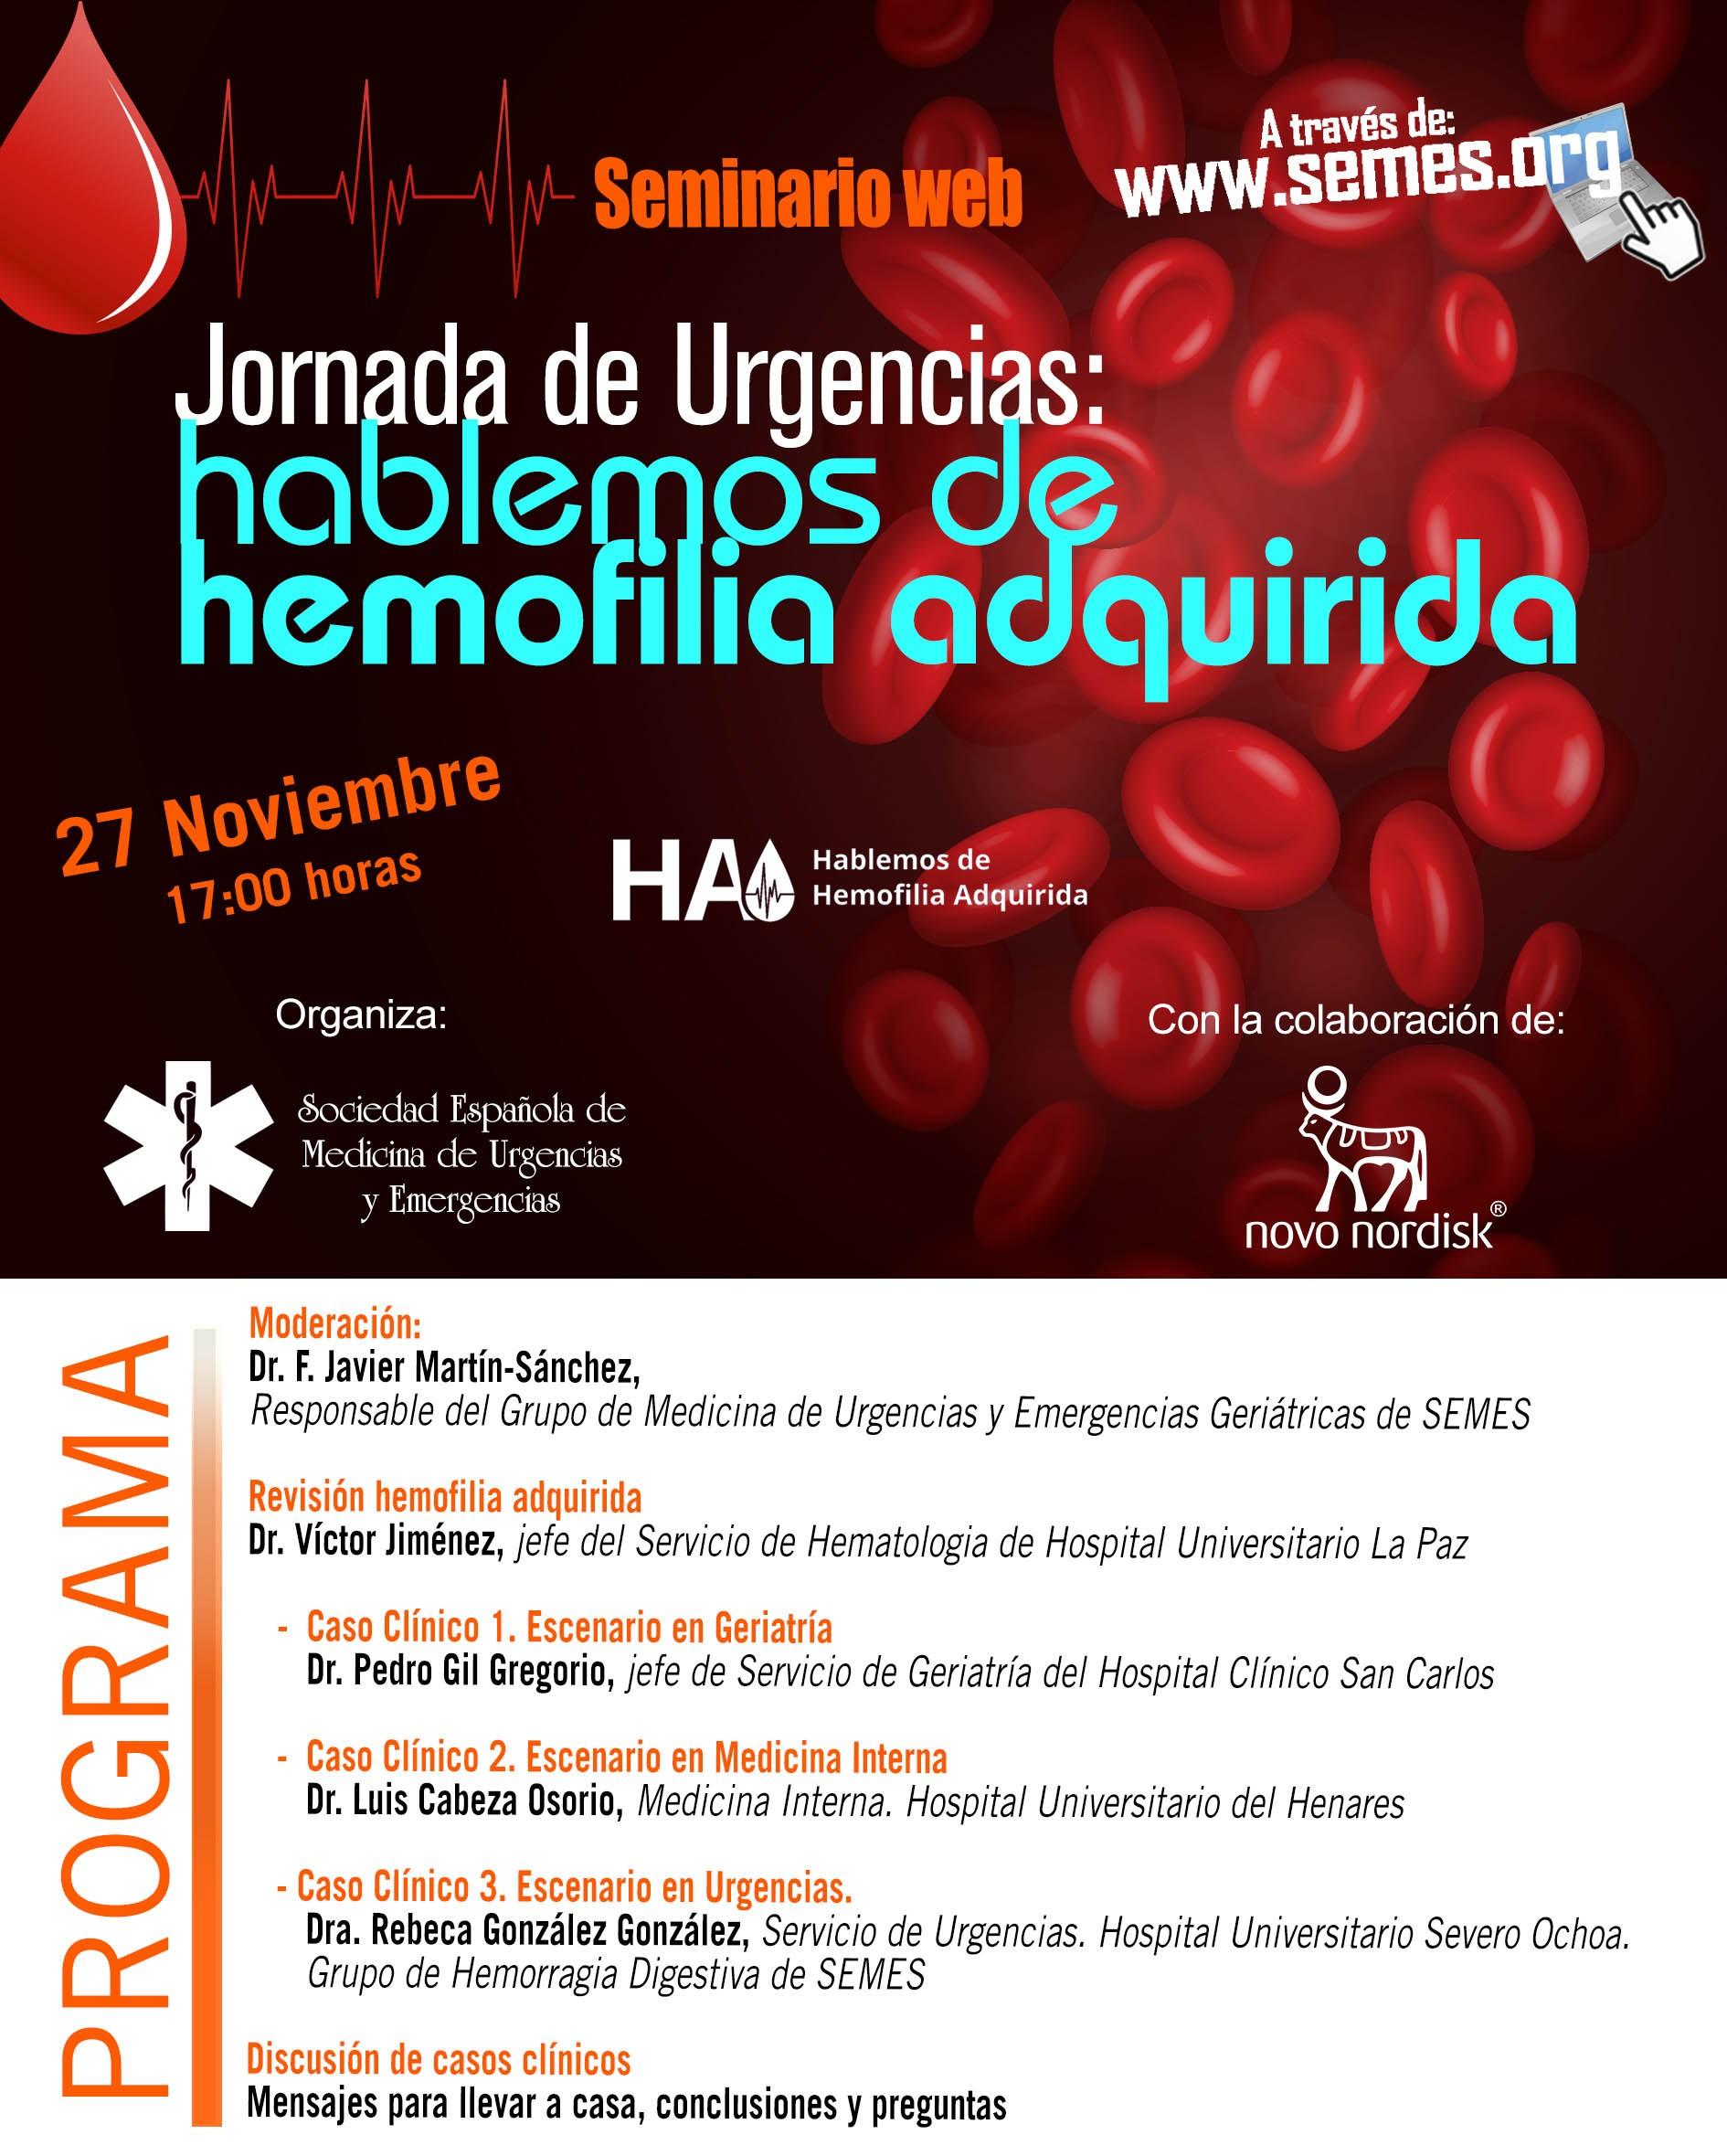 Jornada de Urgencias - Hablemos de Hemofilia Adquirida